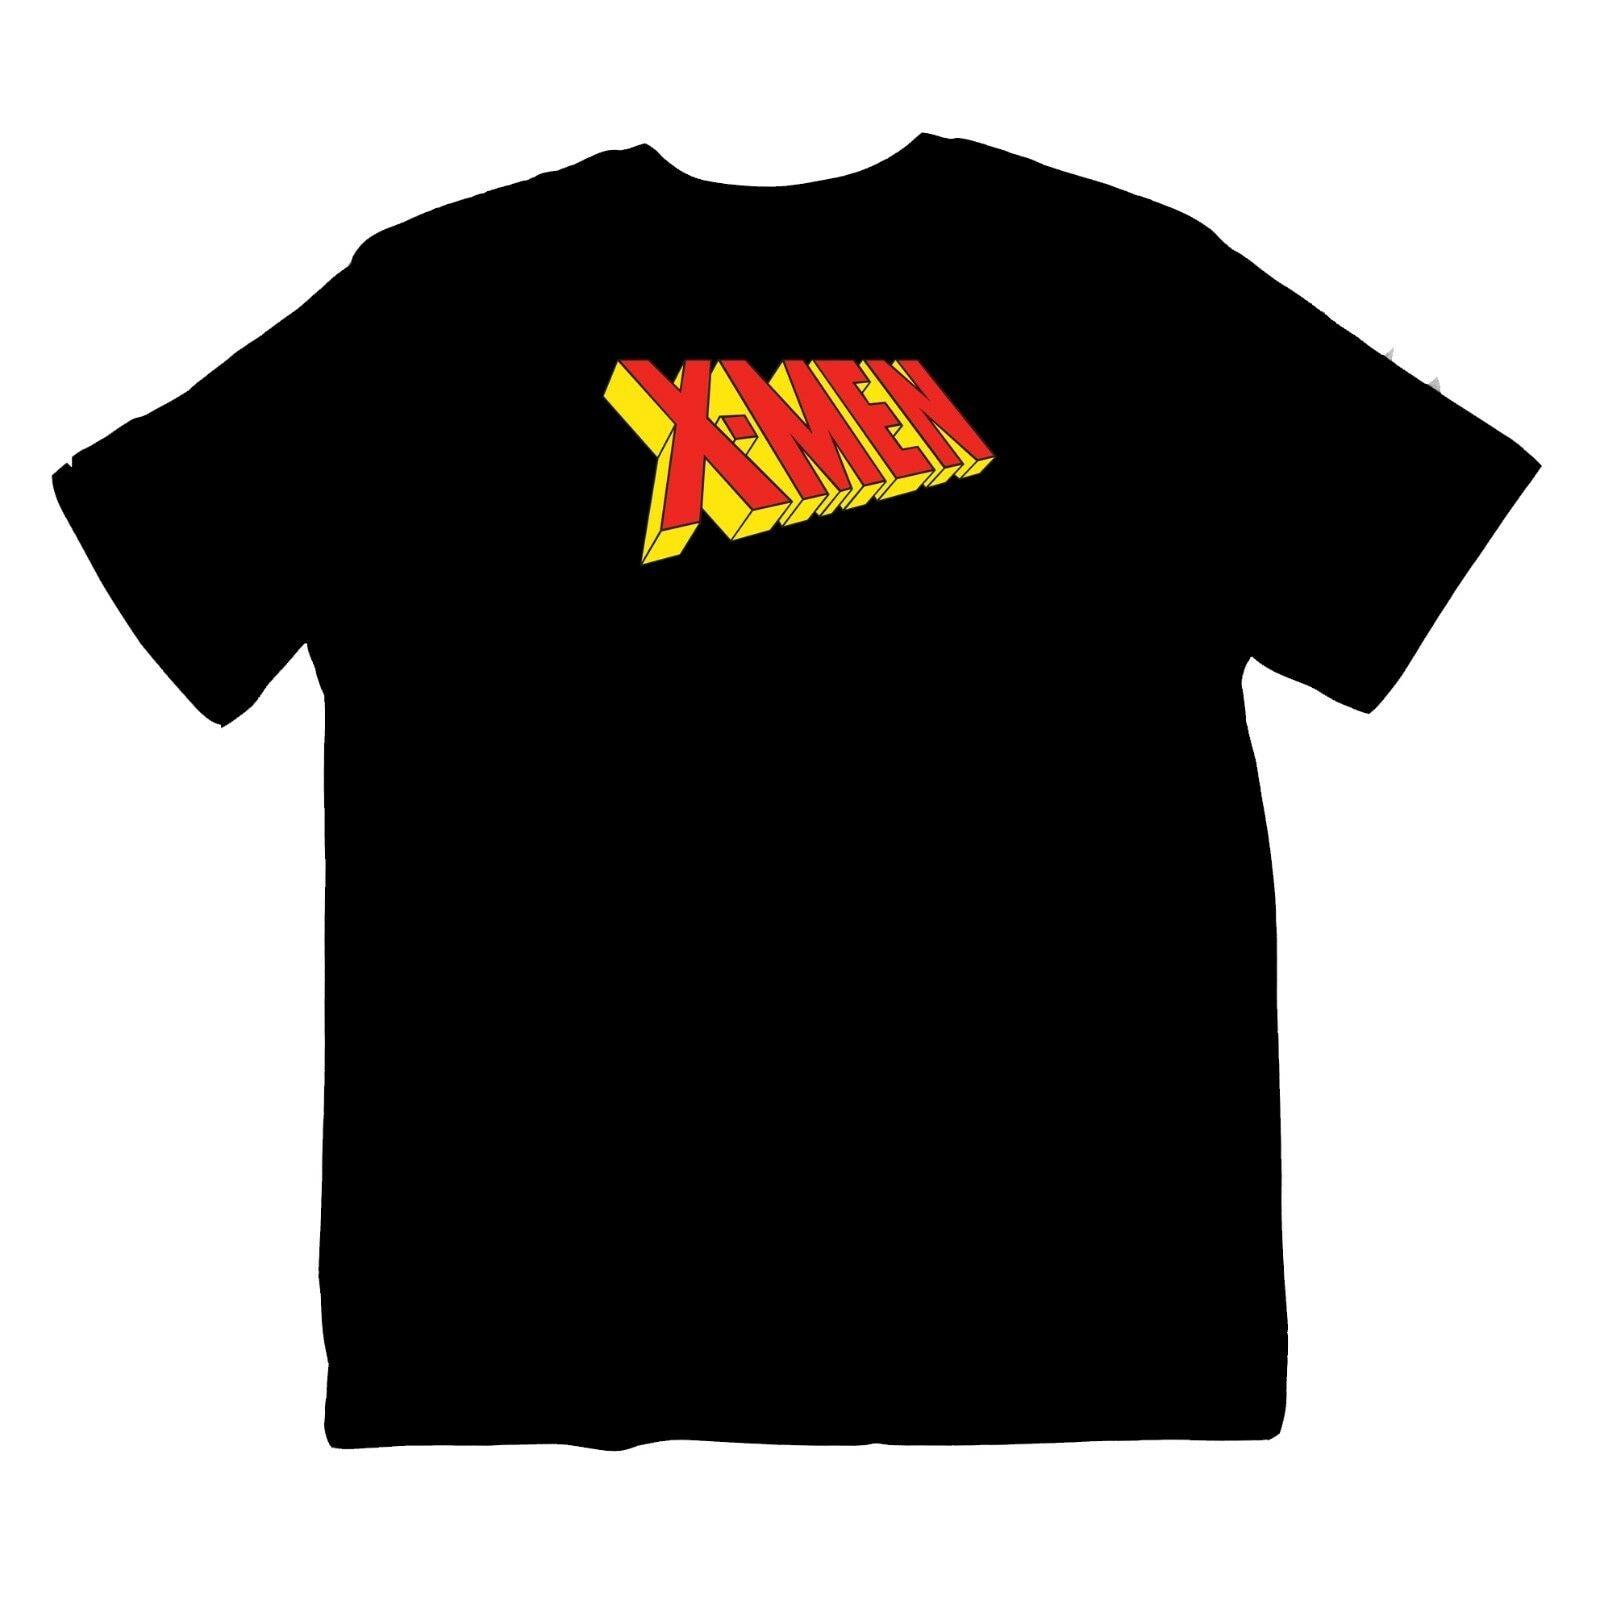 Camiseta x-men con logo de Marvel MCU Cheez TV 90, Camiseta animada de dibujos animados, S-XXXL Camiseta con estampado de color, camiseta de moda de manga corta